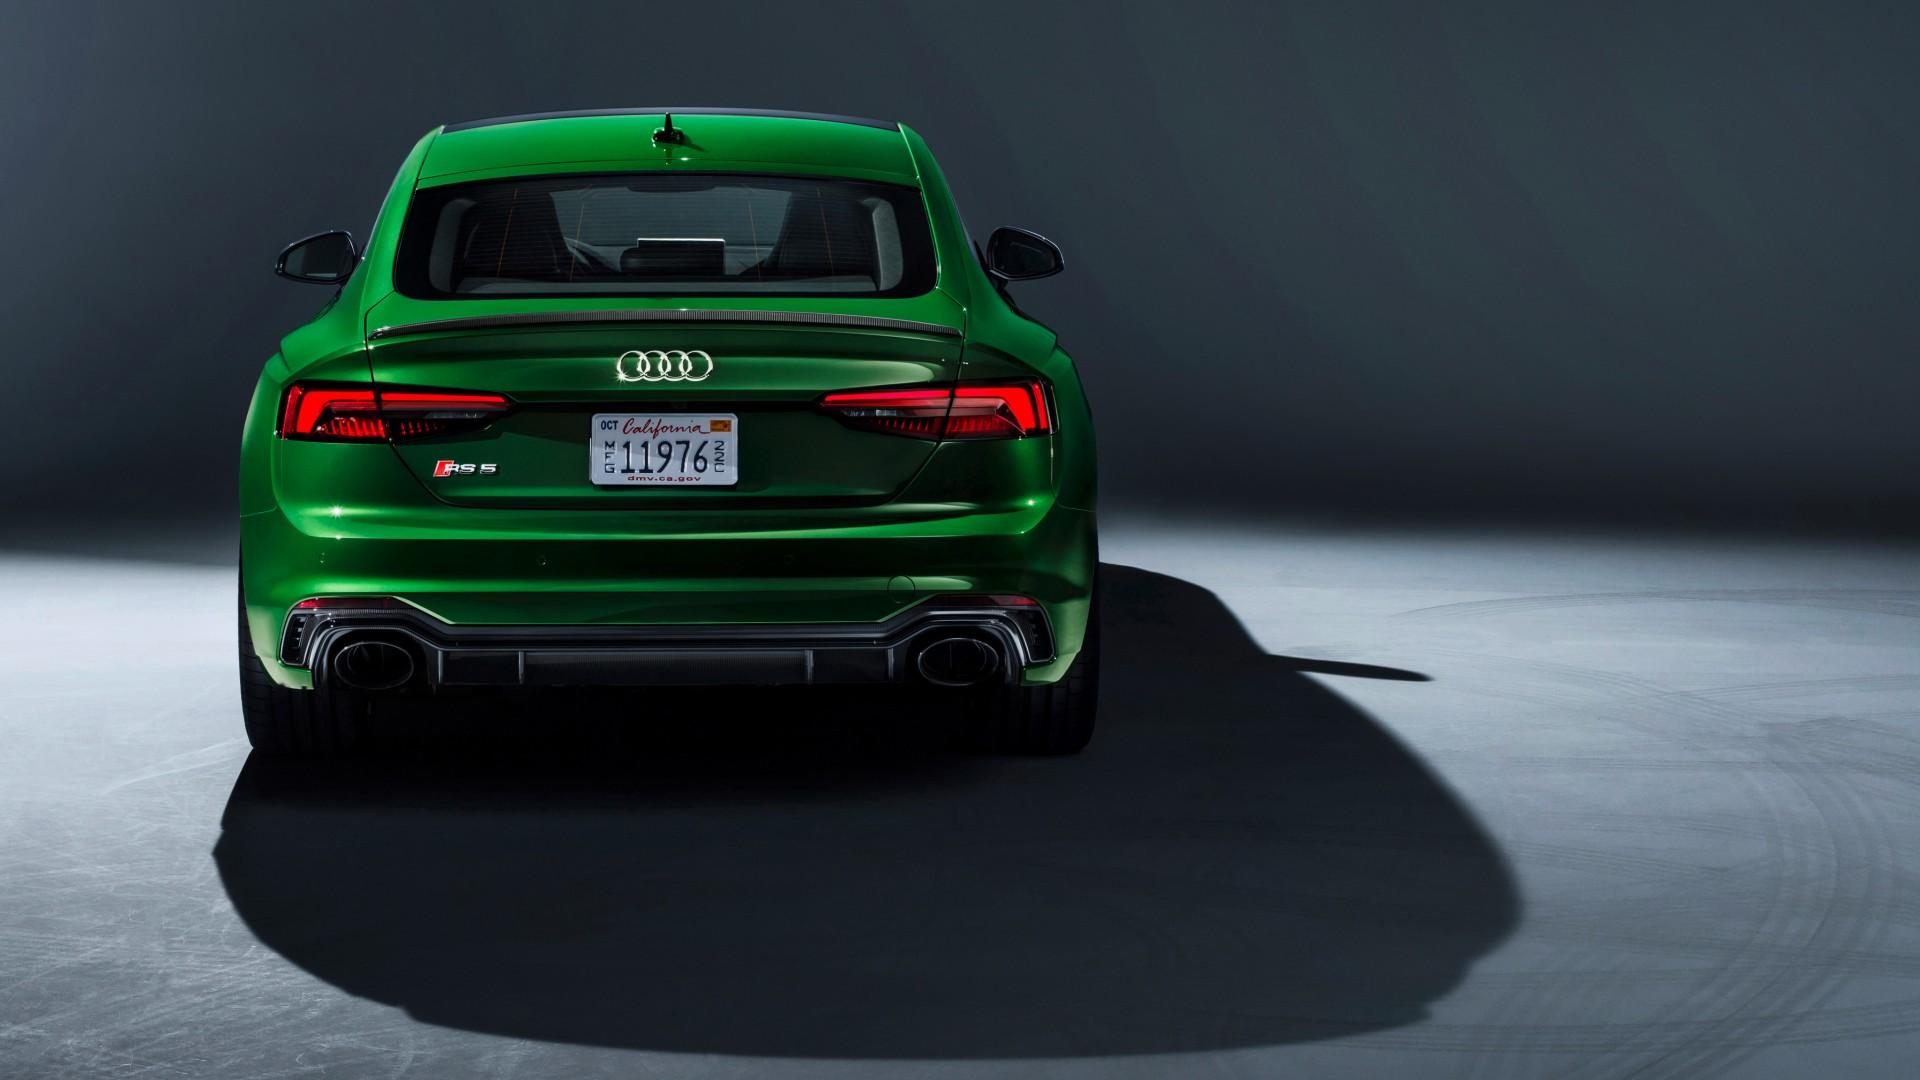 2019 Audi Rs 5 Sportback 4k 3 Wallpaper Hd Car